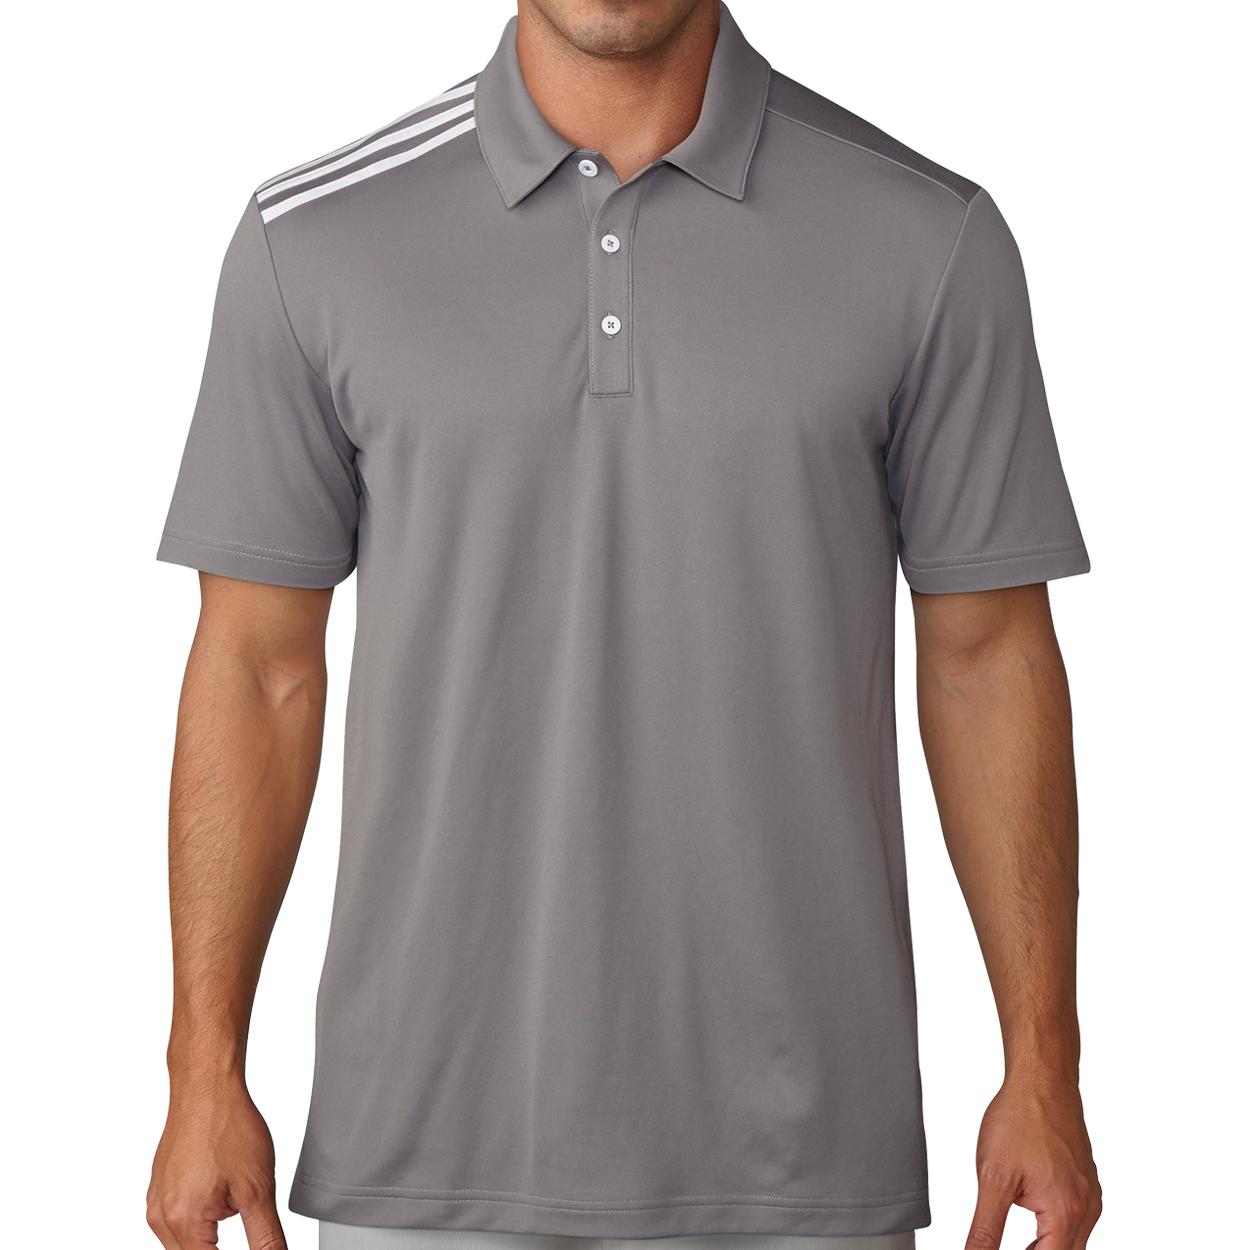 adidas Golf Men's Essential 3 Stripe Polo Shirt (Various Colors) $15 w/ Free Shipping